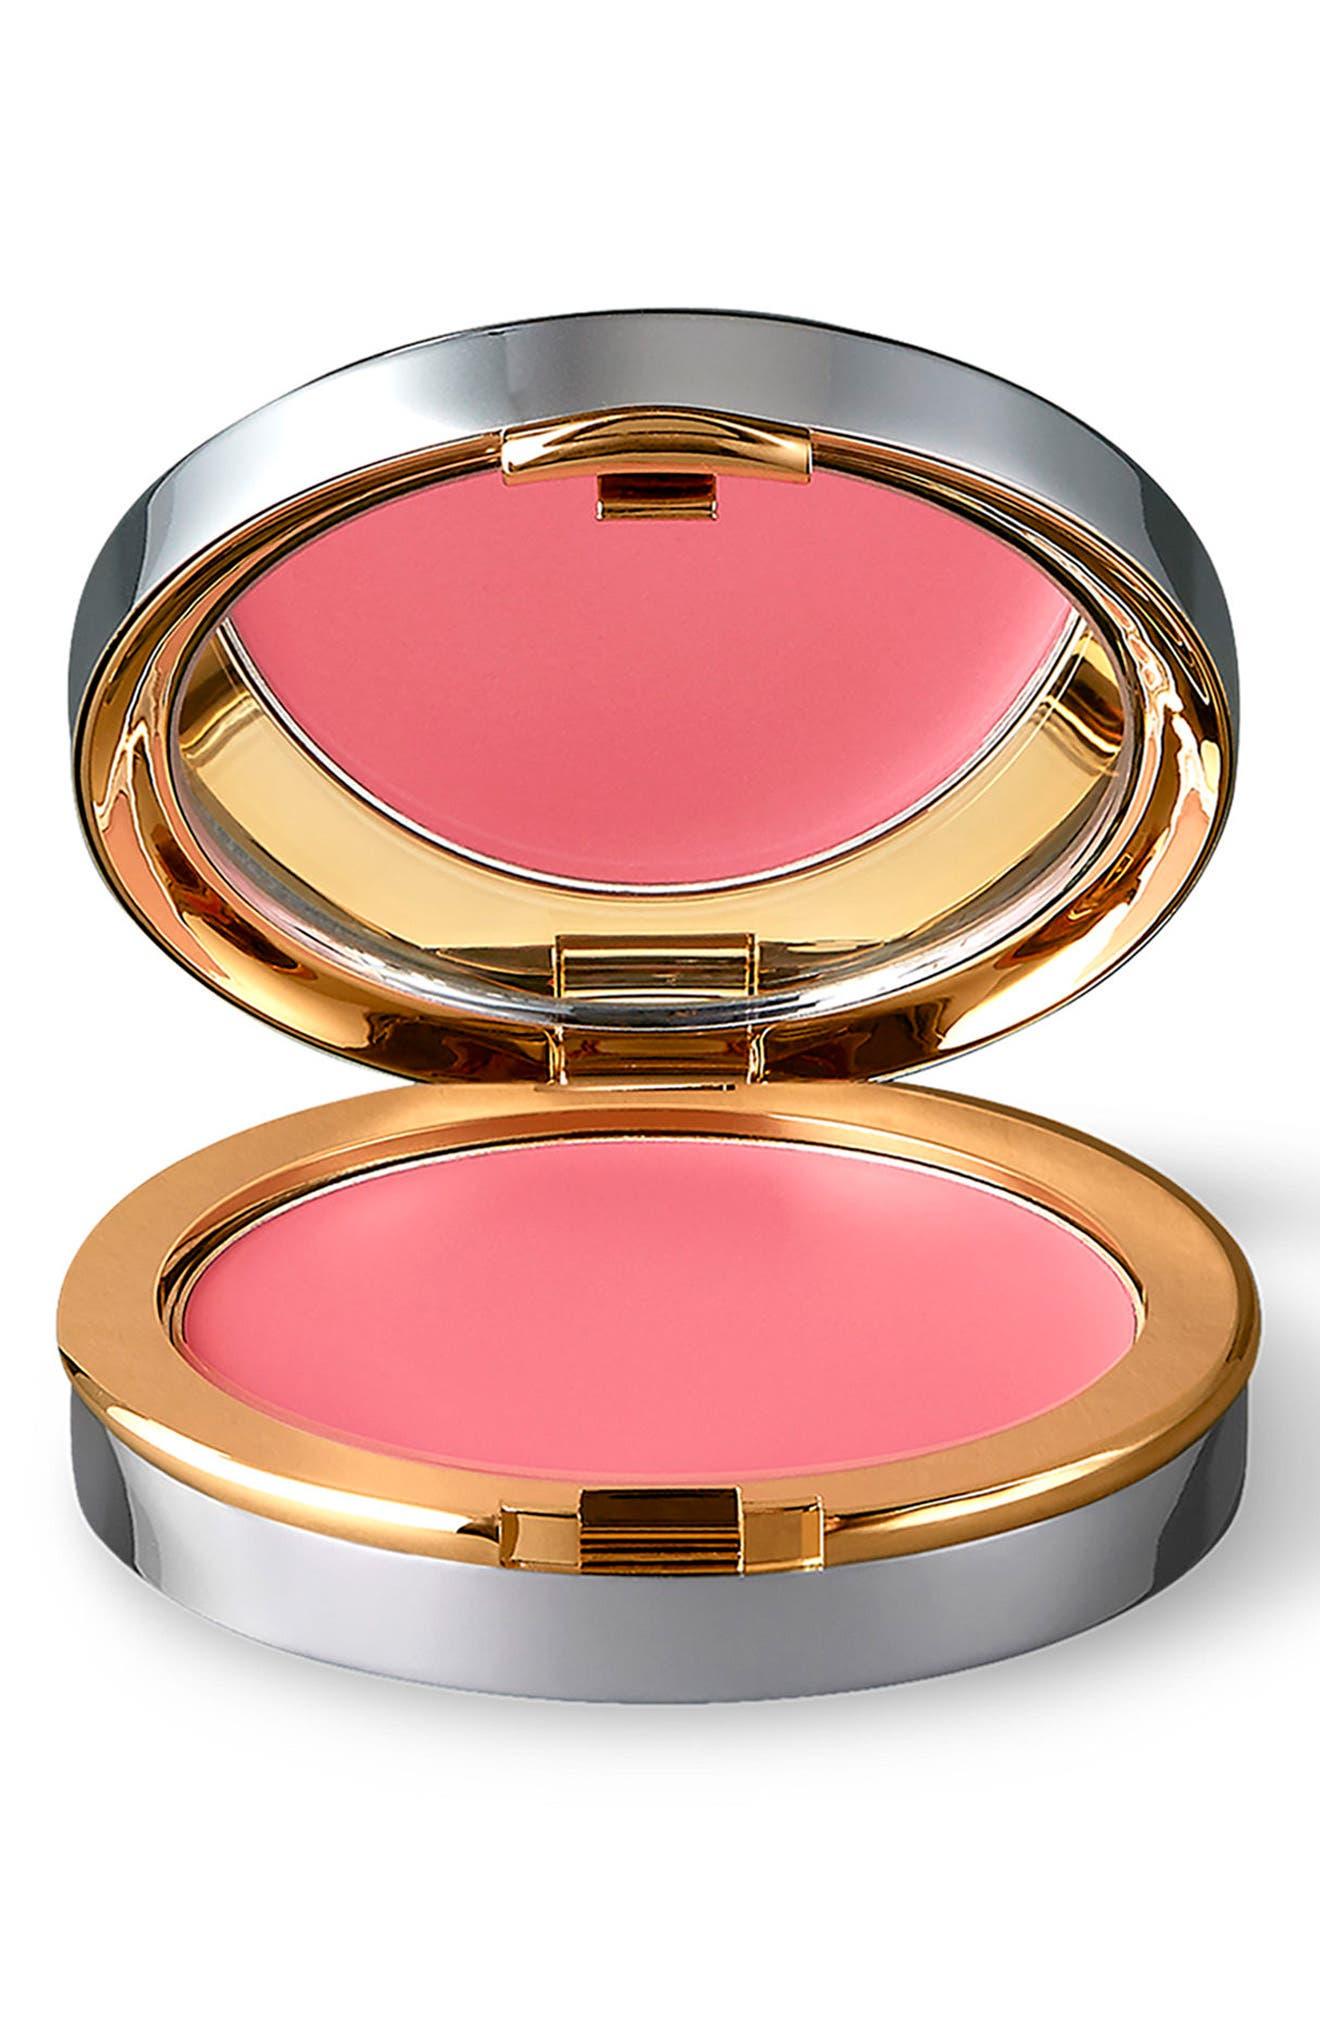 Cellular Radiance Cream Blush,                             Main thumbnail 1, color,                             Rose Glow